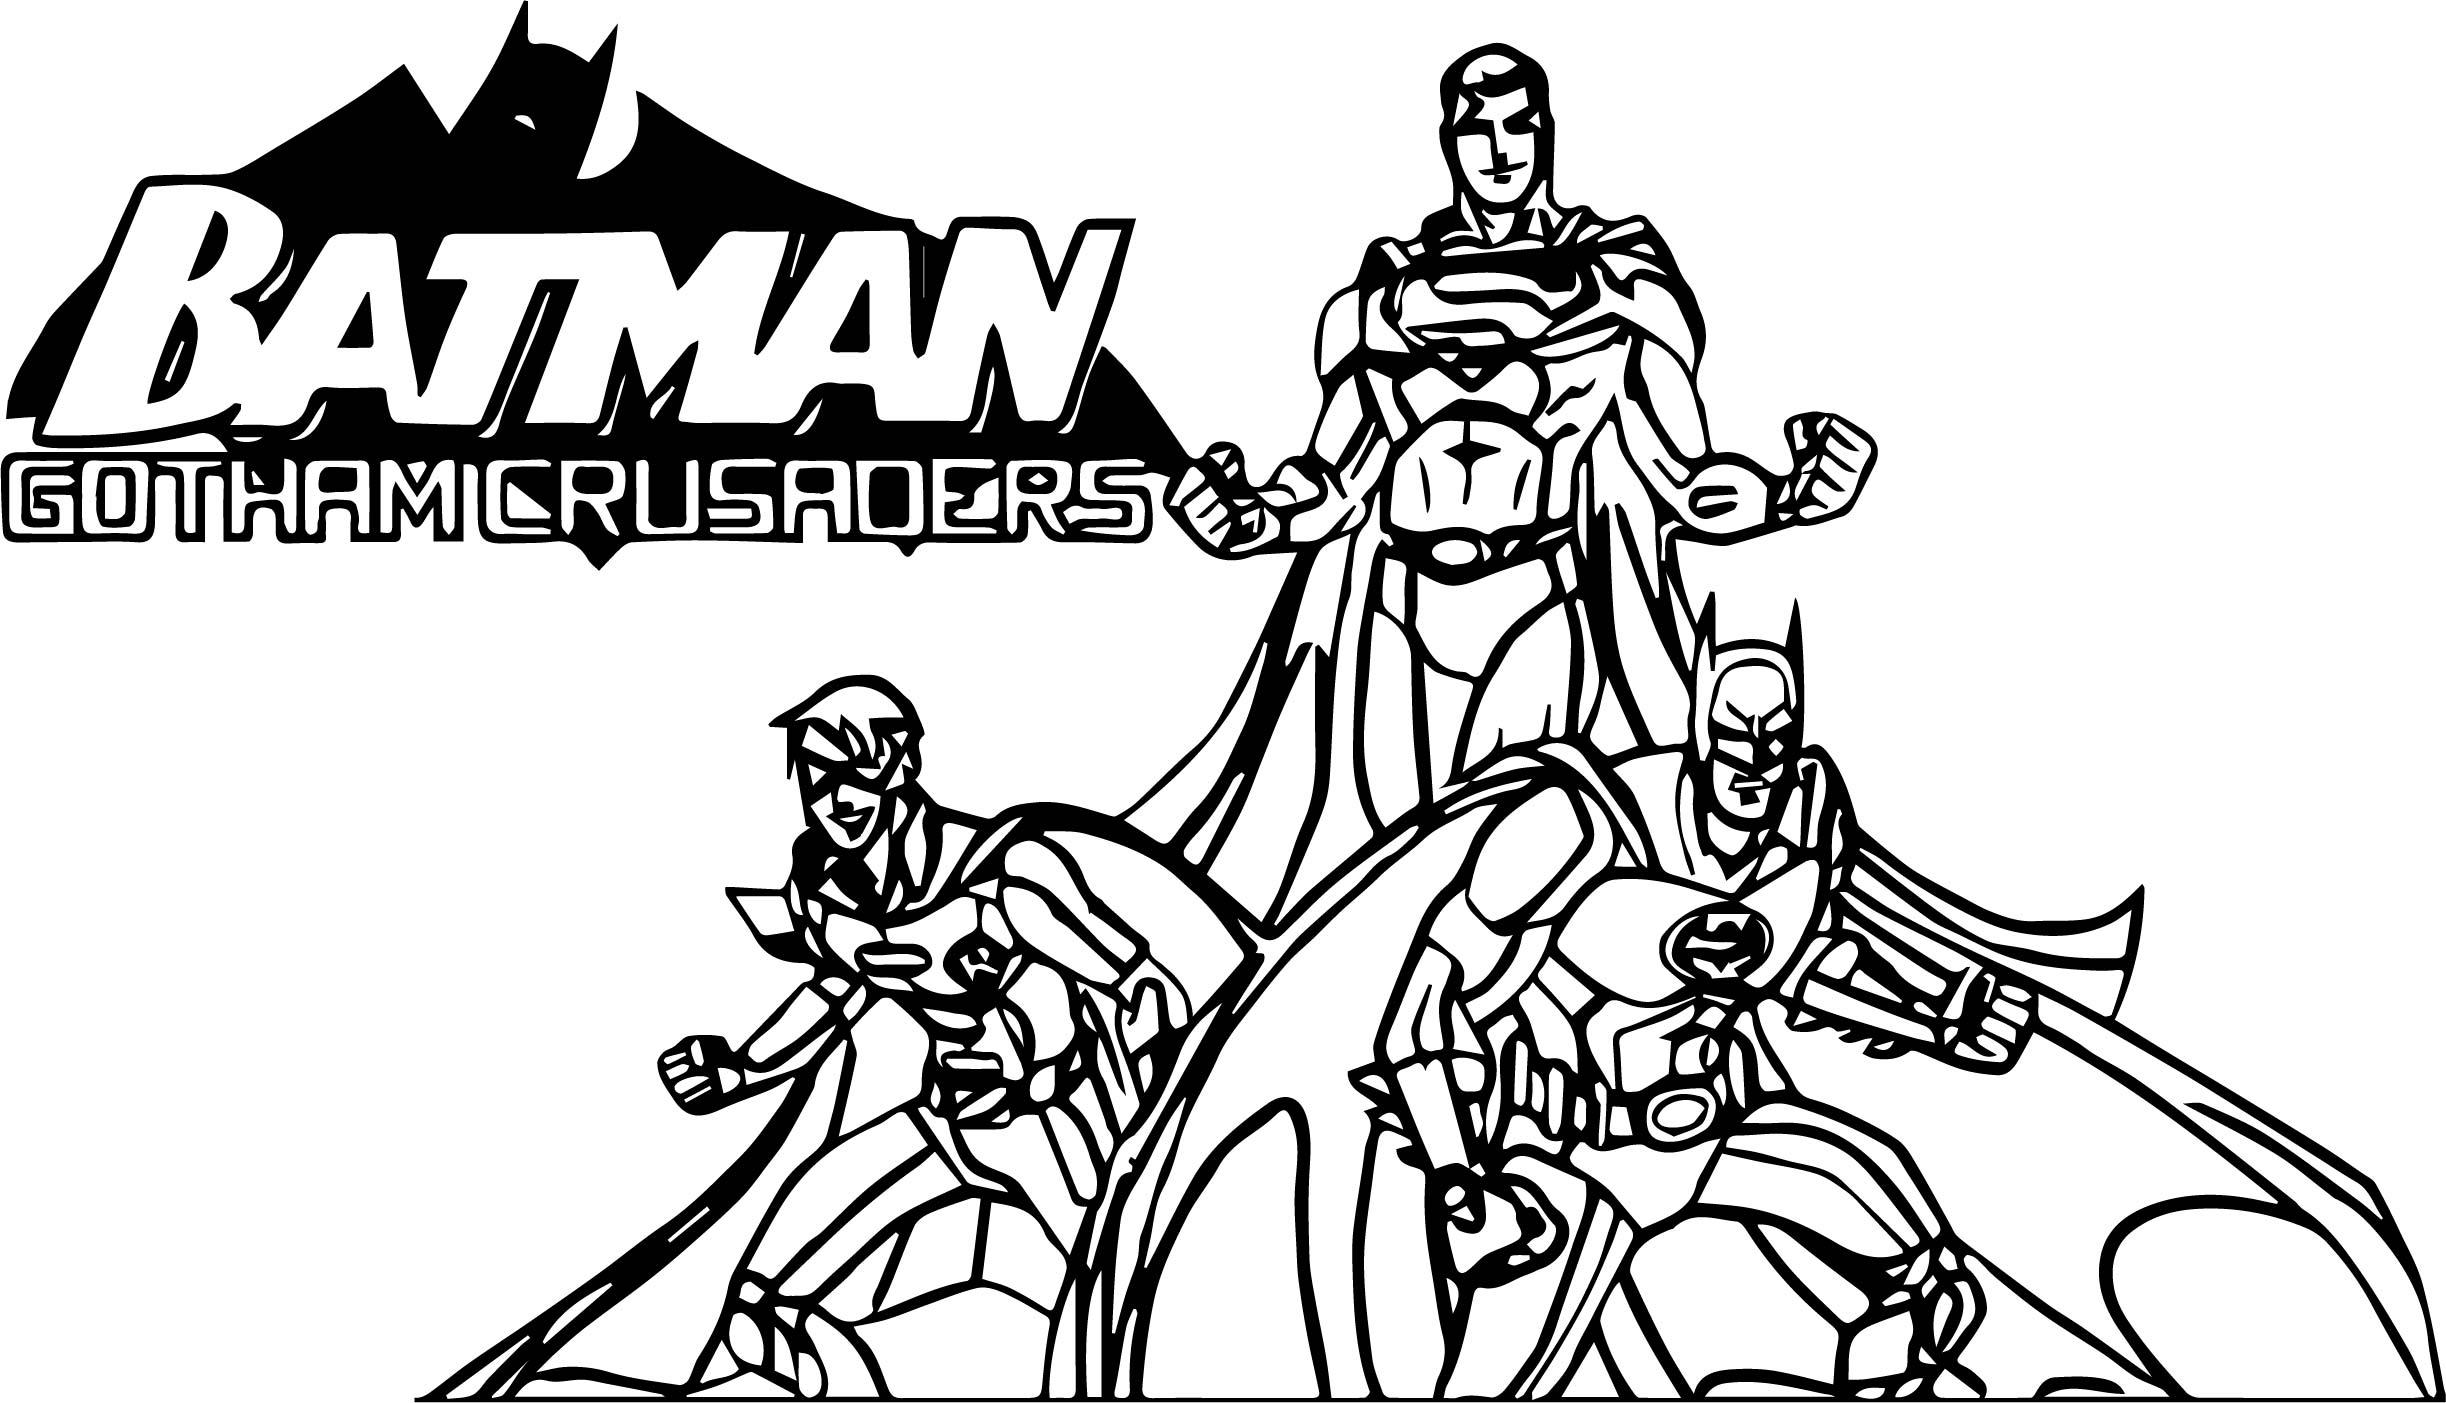 Gotham Crusaders Cover Batman Coloring Page